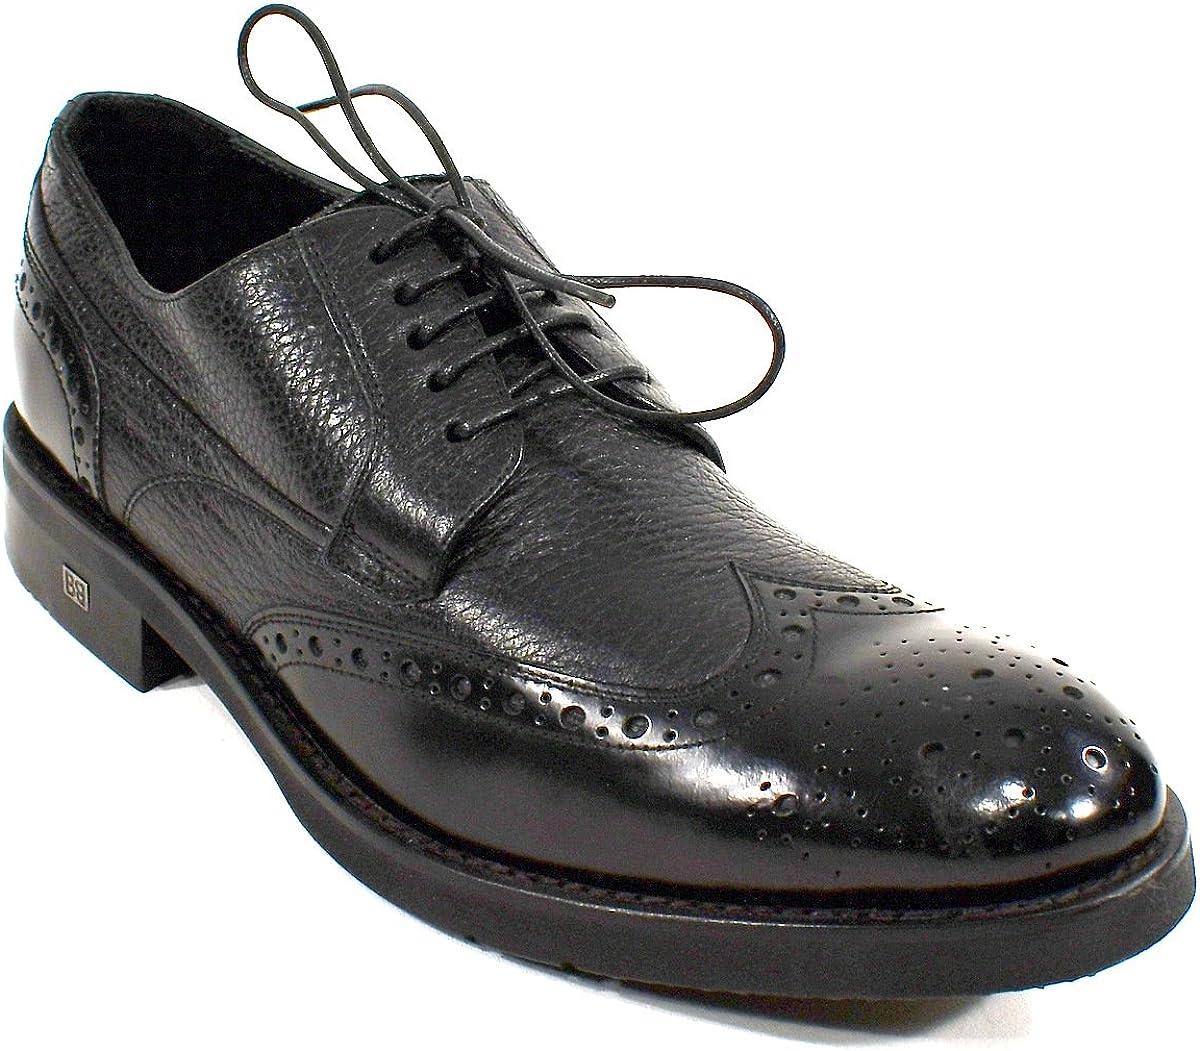 Baldinini Man's Black Leather Oxford Shoes